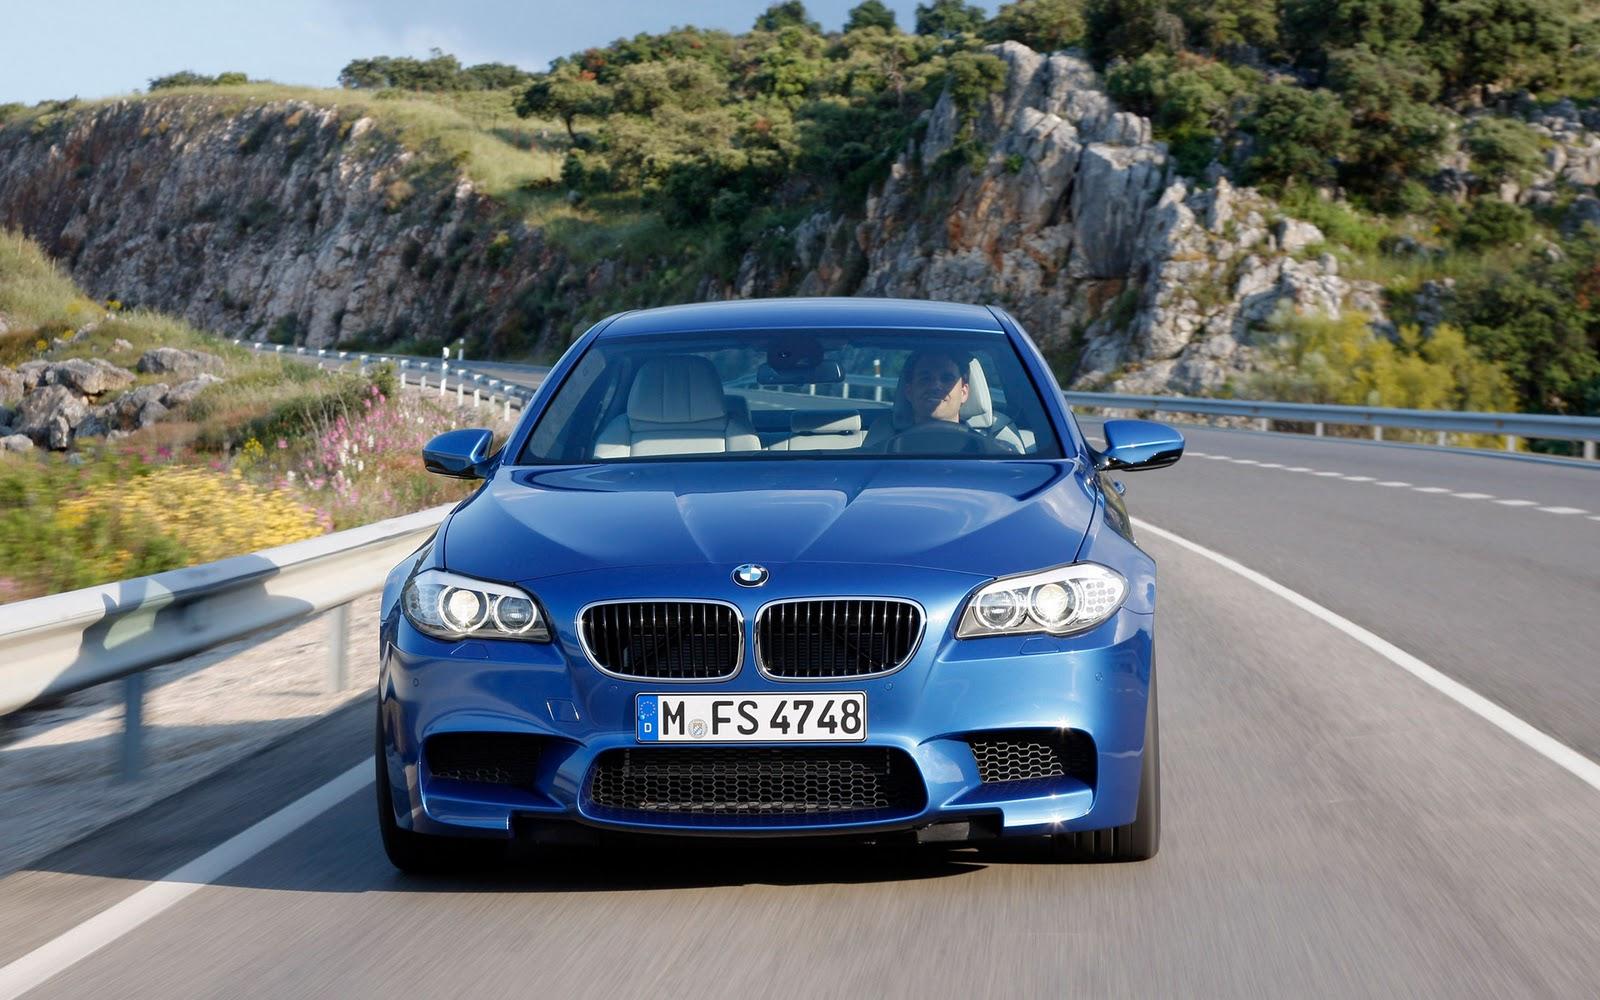 http://4.bp.blogspot.com/-8REnN1fTSmI/TuJThsAbi6I/AAAAAAAABro/fg059qy45ws/s1600/Blue-BMW-M5-F10-Front-View_1920x1200_6853.jpg